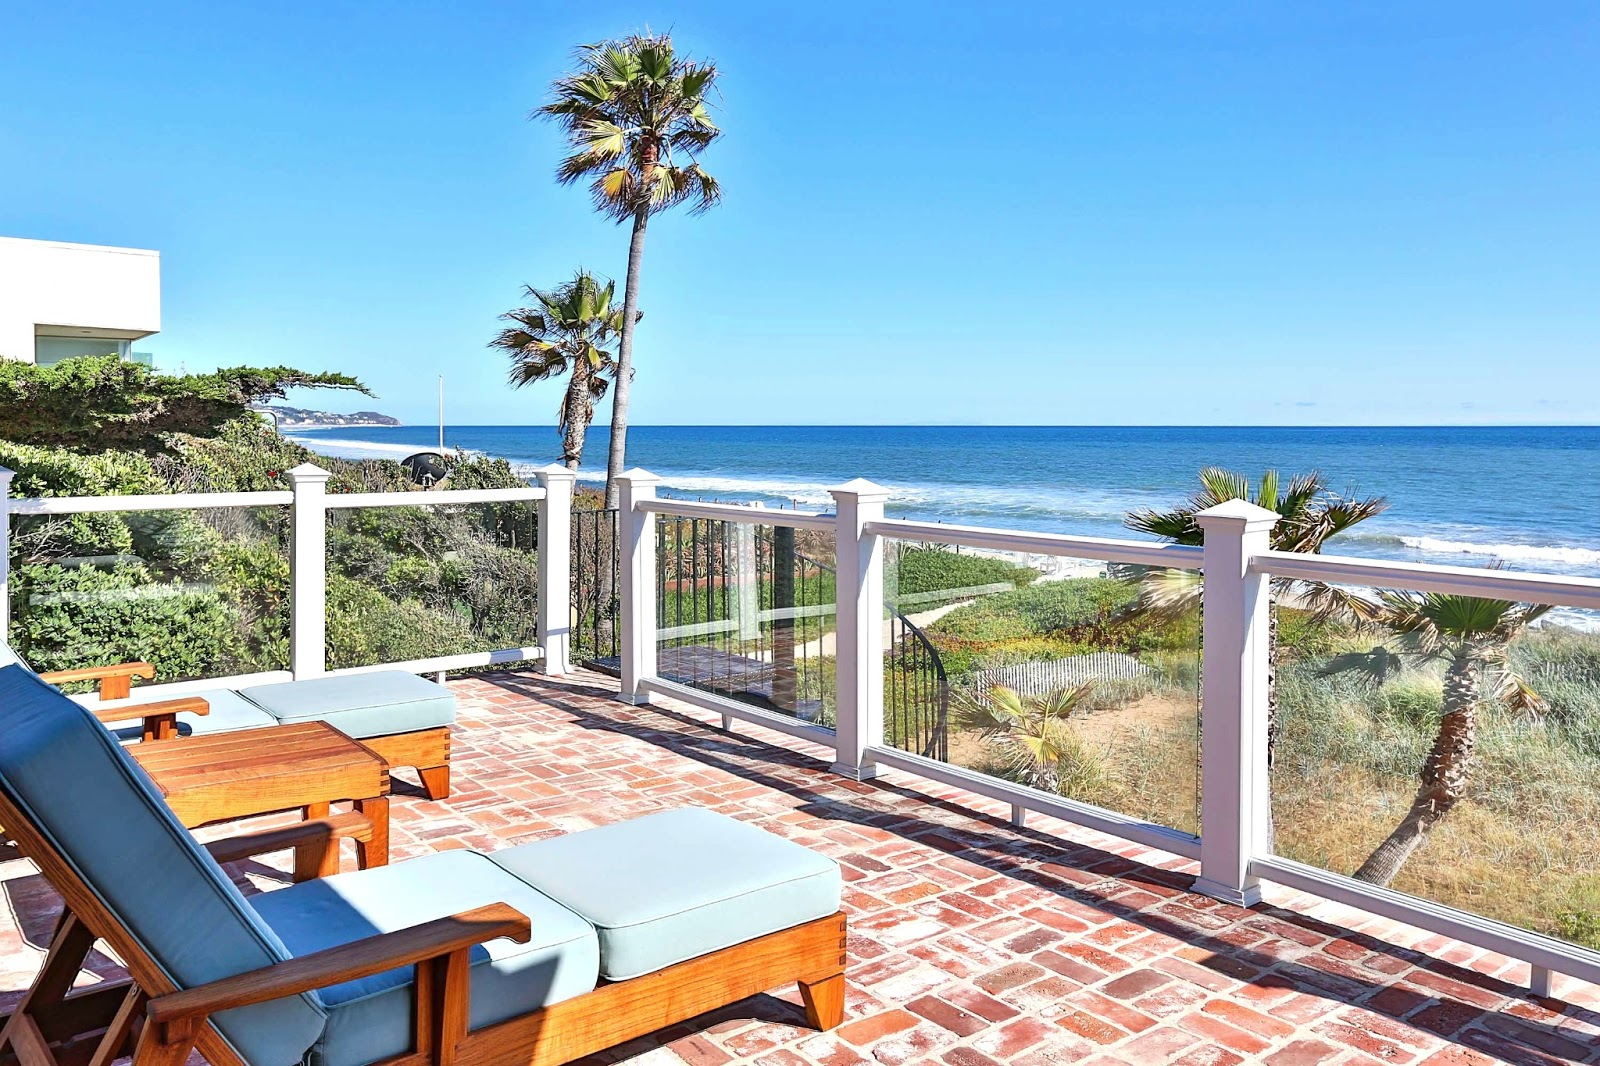 Cococozy 24 million dollar malibu estate see this house for Malibu california beach houses